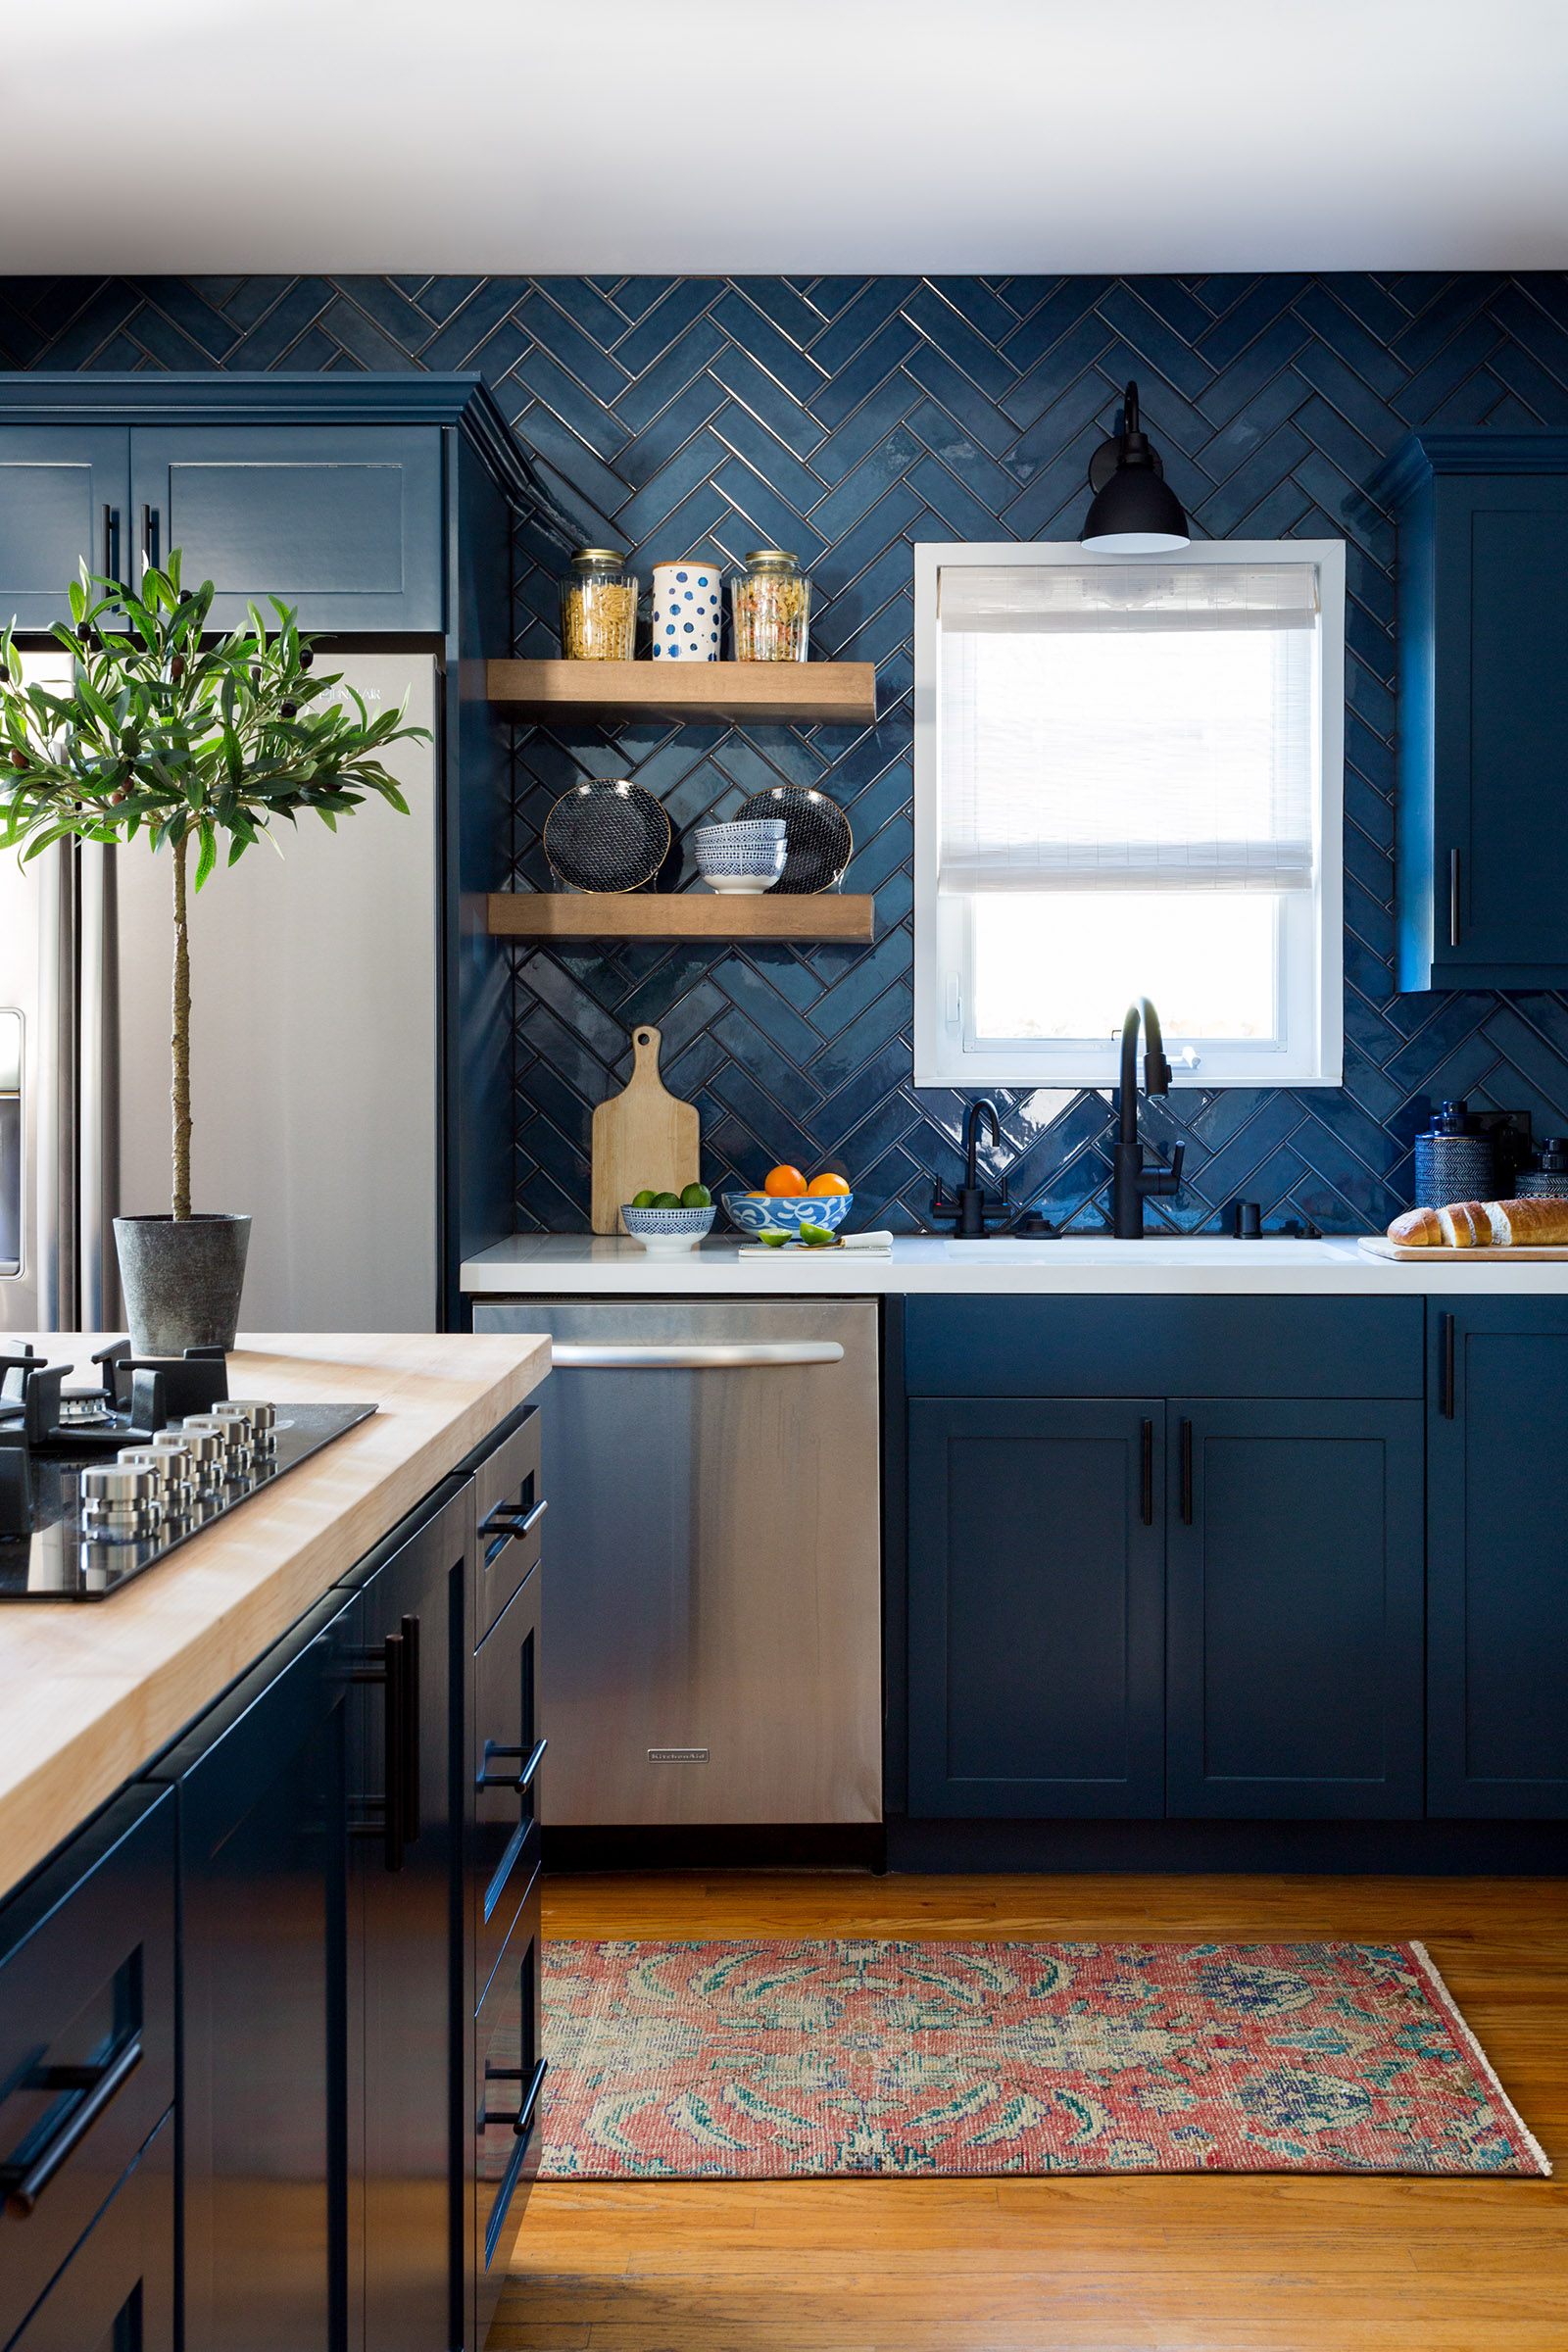 I\u0027m crazy about this deep moody blue cabinets and the coordinating herringbone tile backsplash isn\u0027t it stunning? Kitchen design by Jenn Feldman ... & Forever Classic: Blue Kitchen Cabinets - Keriel Craft - Blog